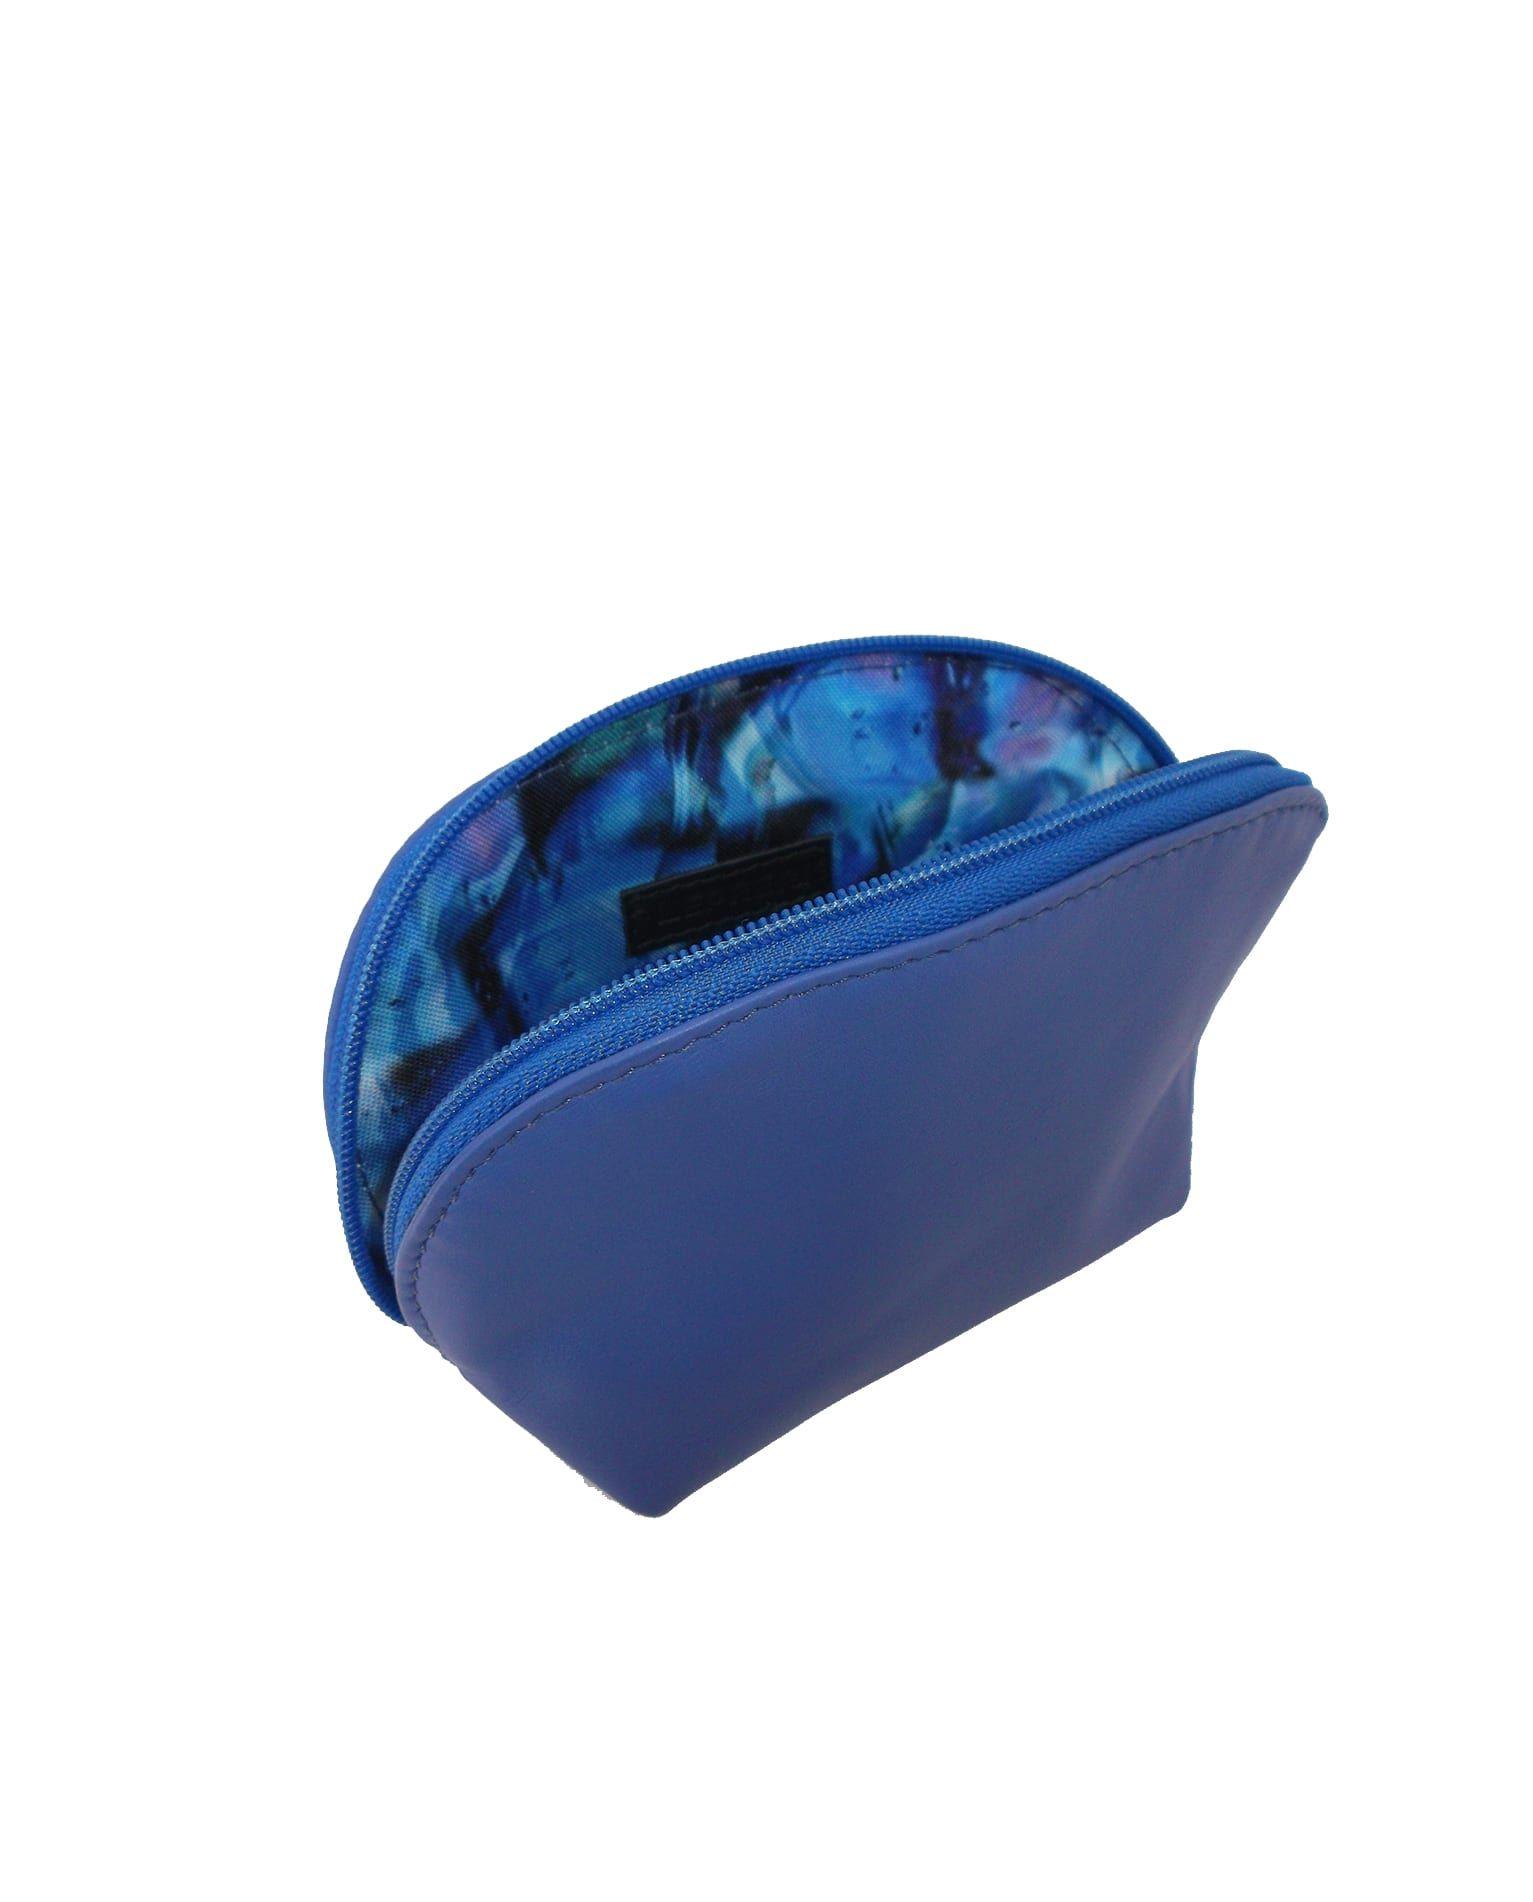 Necessaire azul de couro pequena - LEPRERI - leather